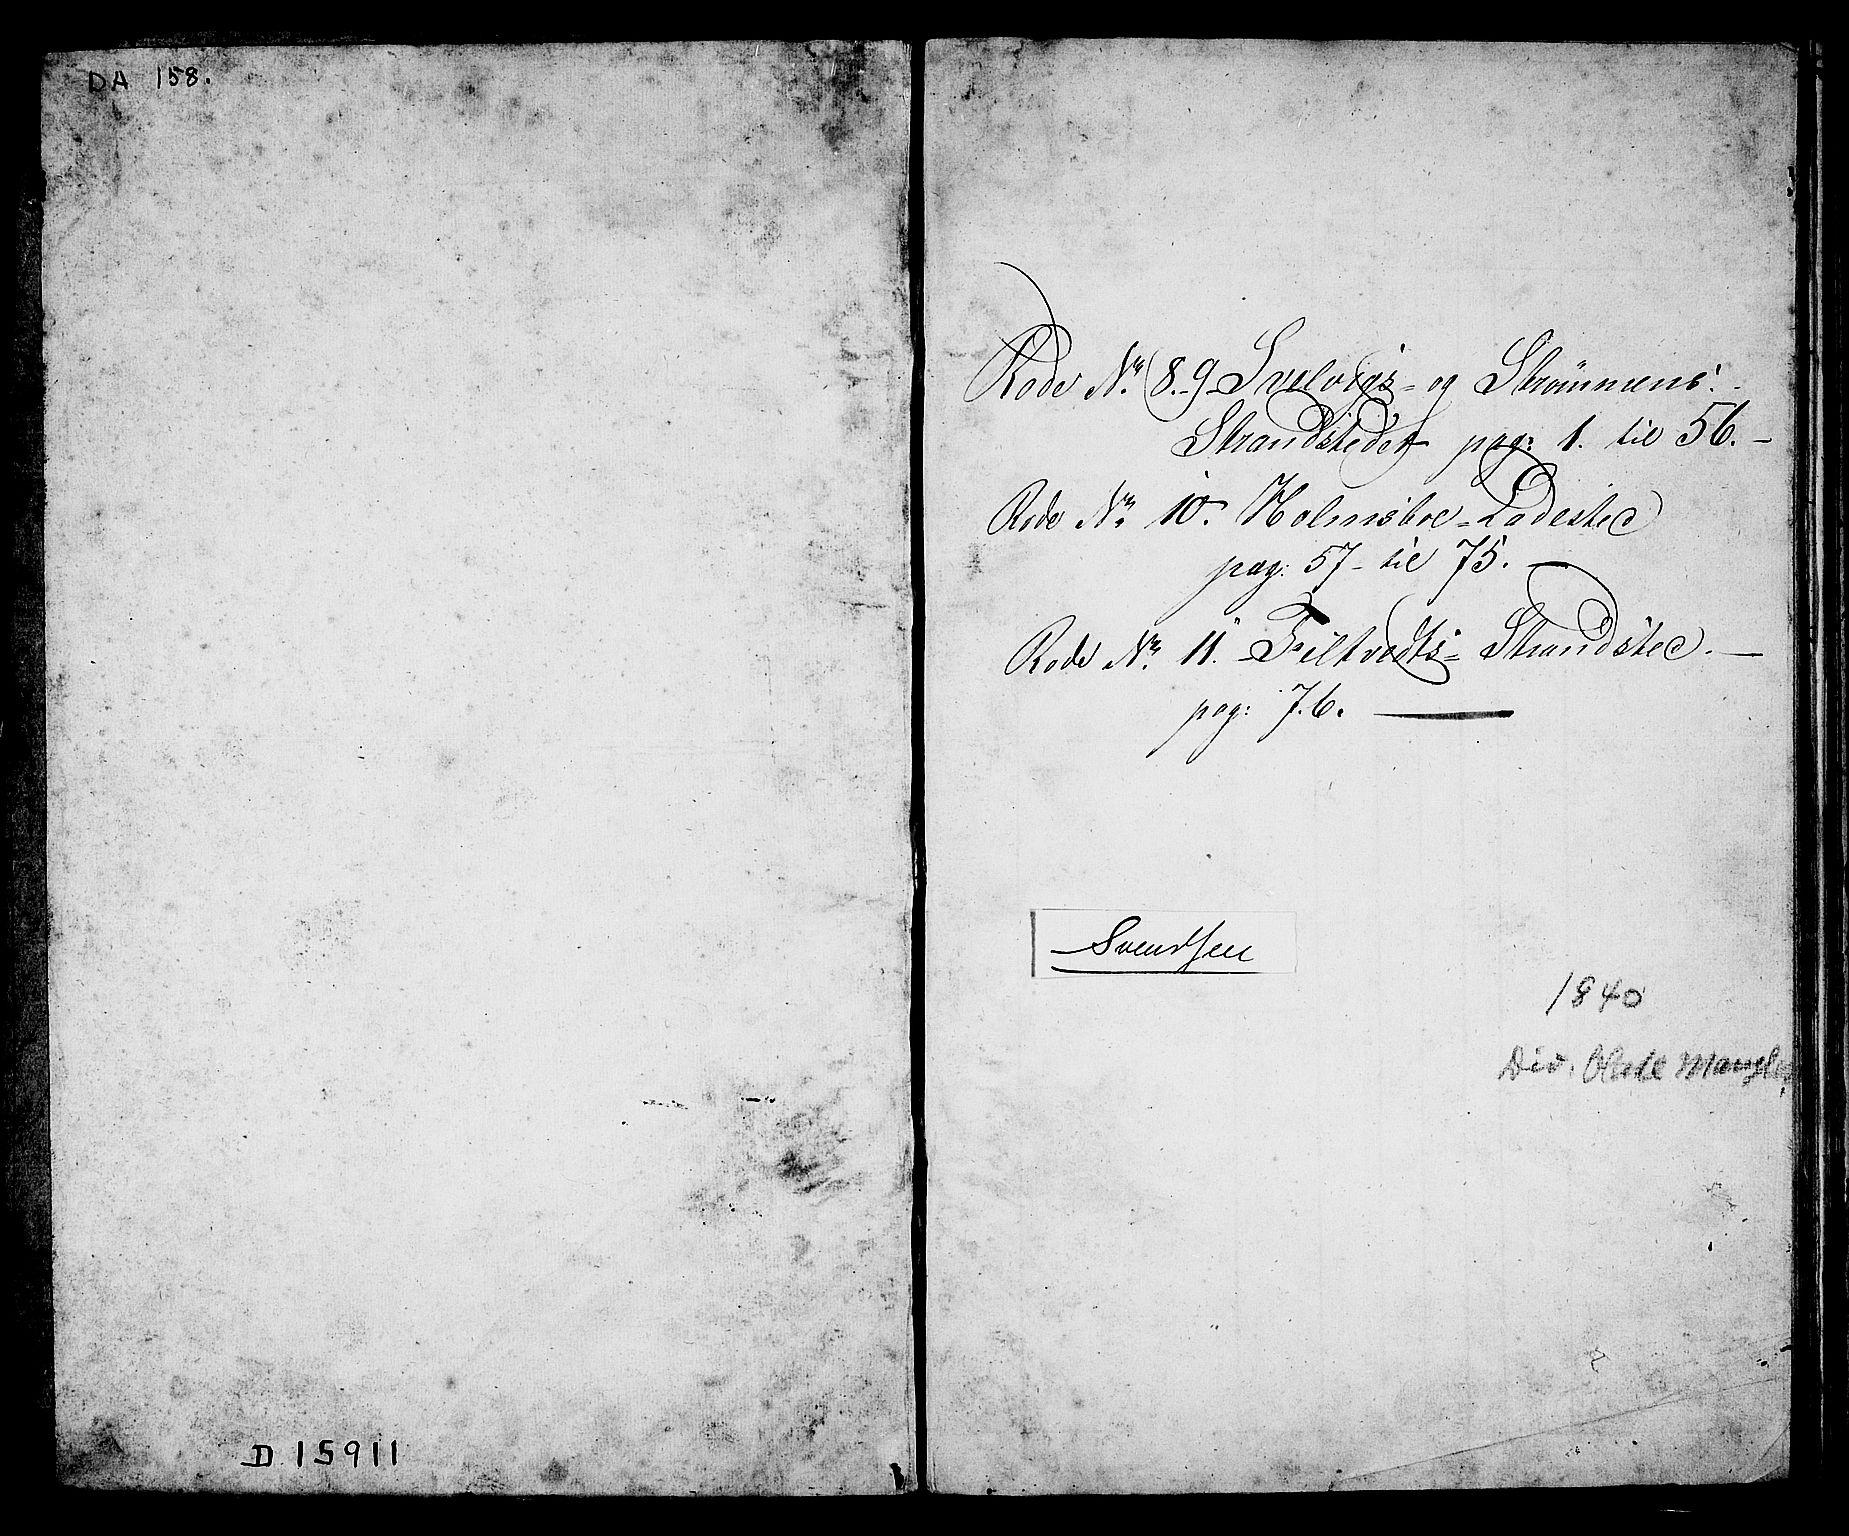 SAKO, Drammen innrulleringsdistrikt, F/Fa/L0006: Ungdomsrulle, 1840-1841, s. 3